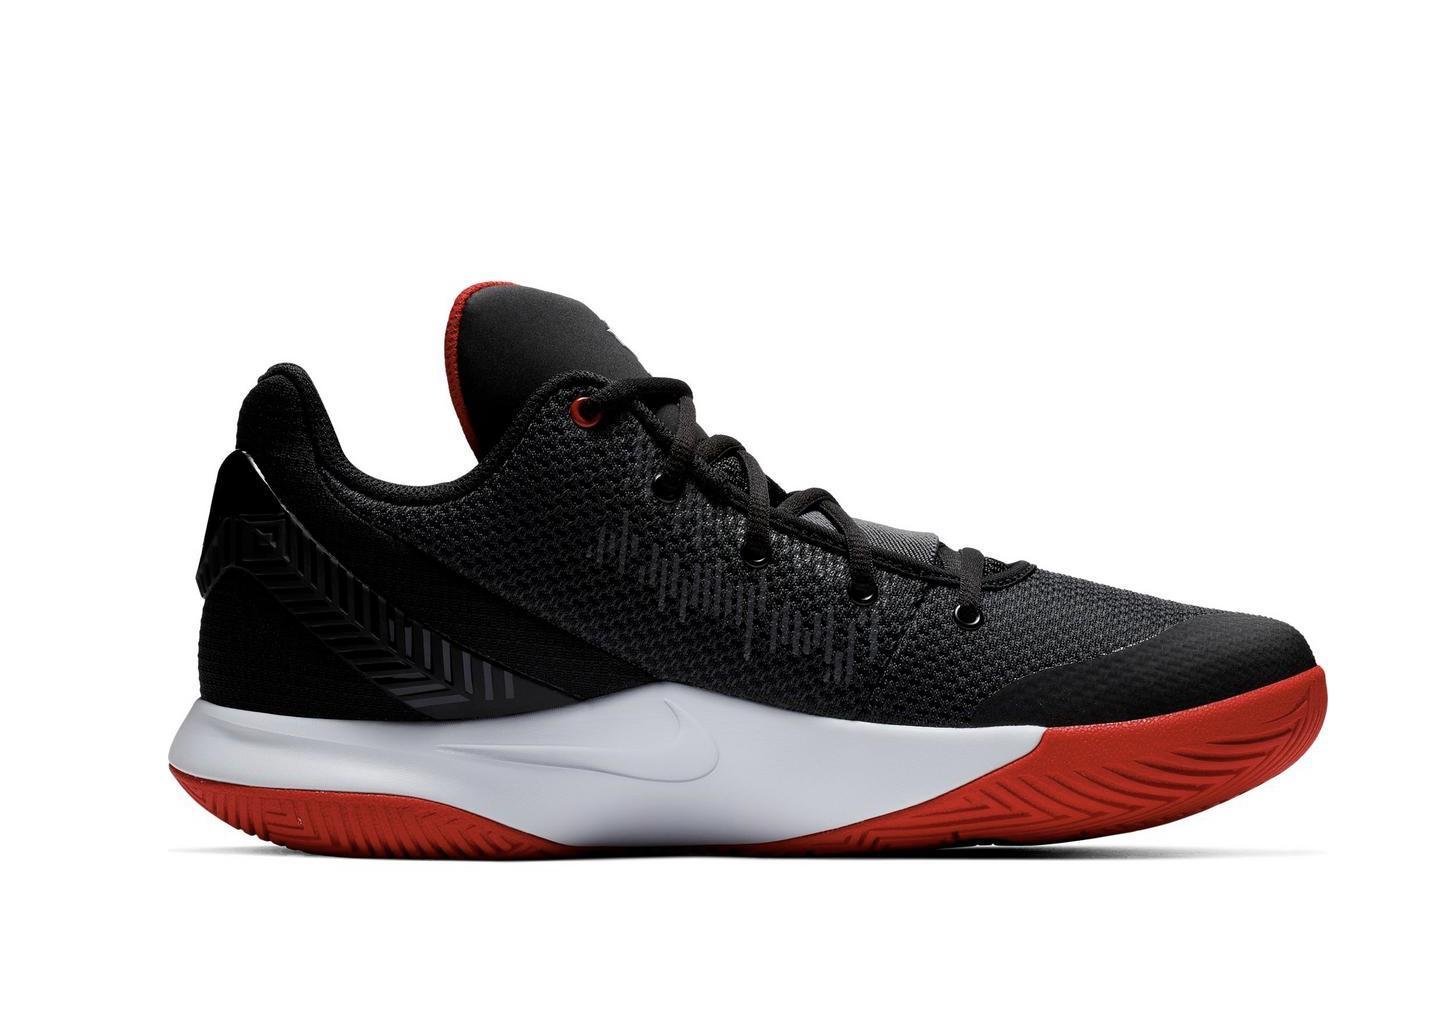 Nike Kyrie Mens 10.5 Basketball Shoes